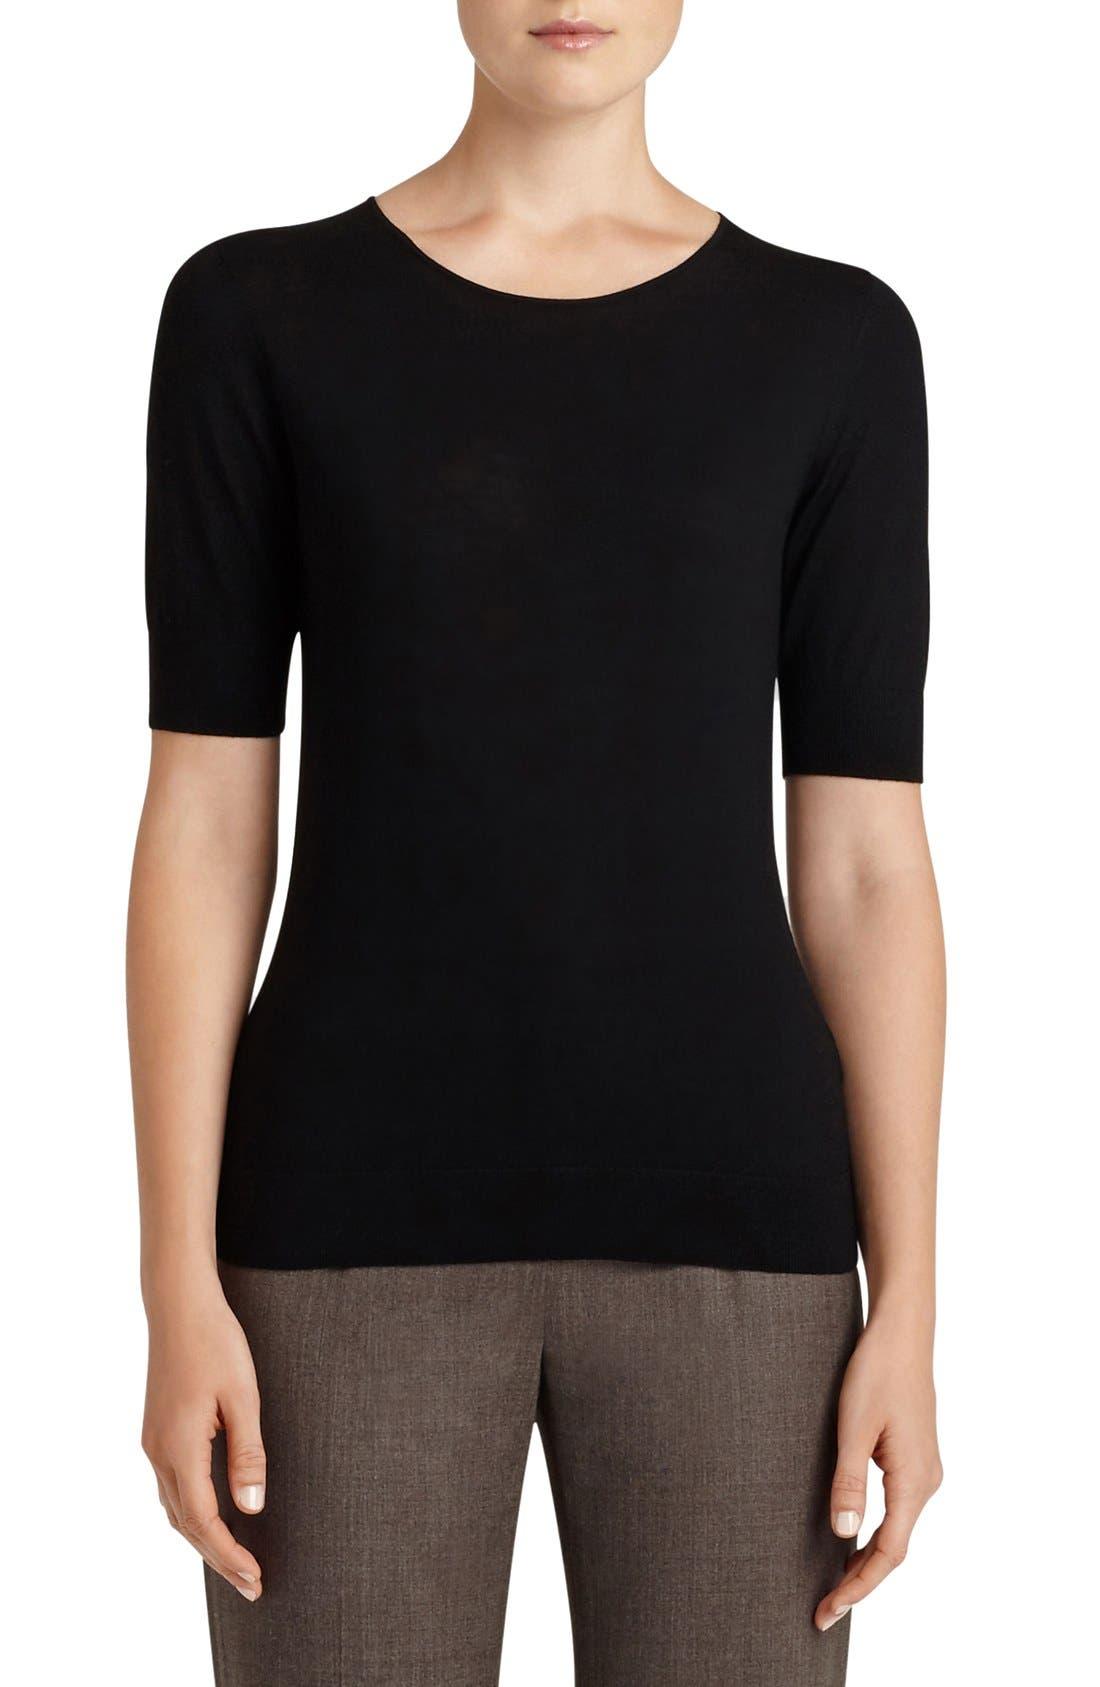 Alternate Image 1 Selected - Lafayette 148 New York Scoop Neck Merino Wool Top